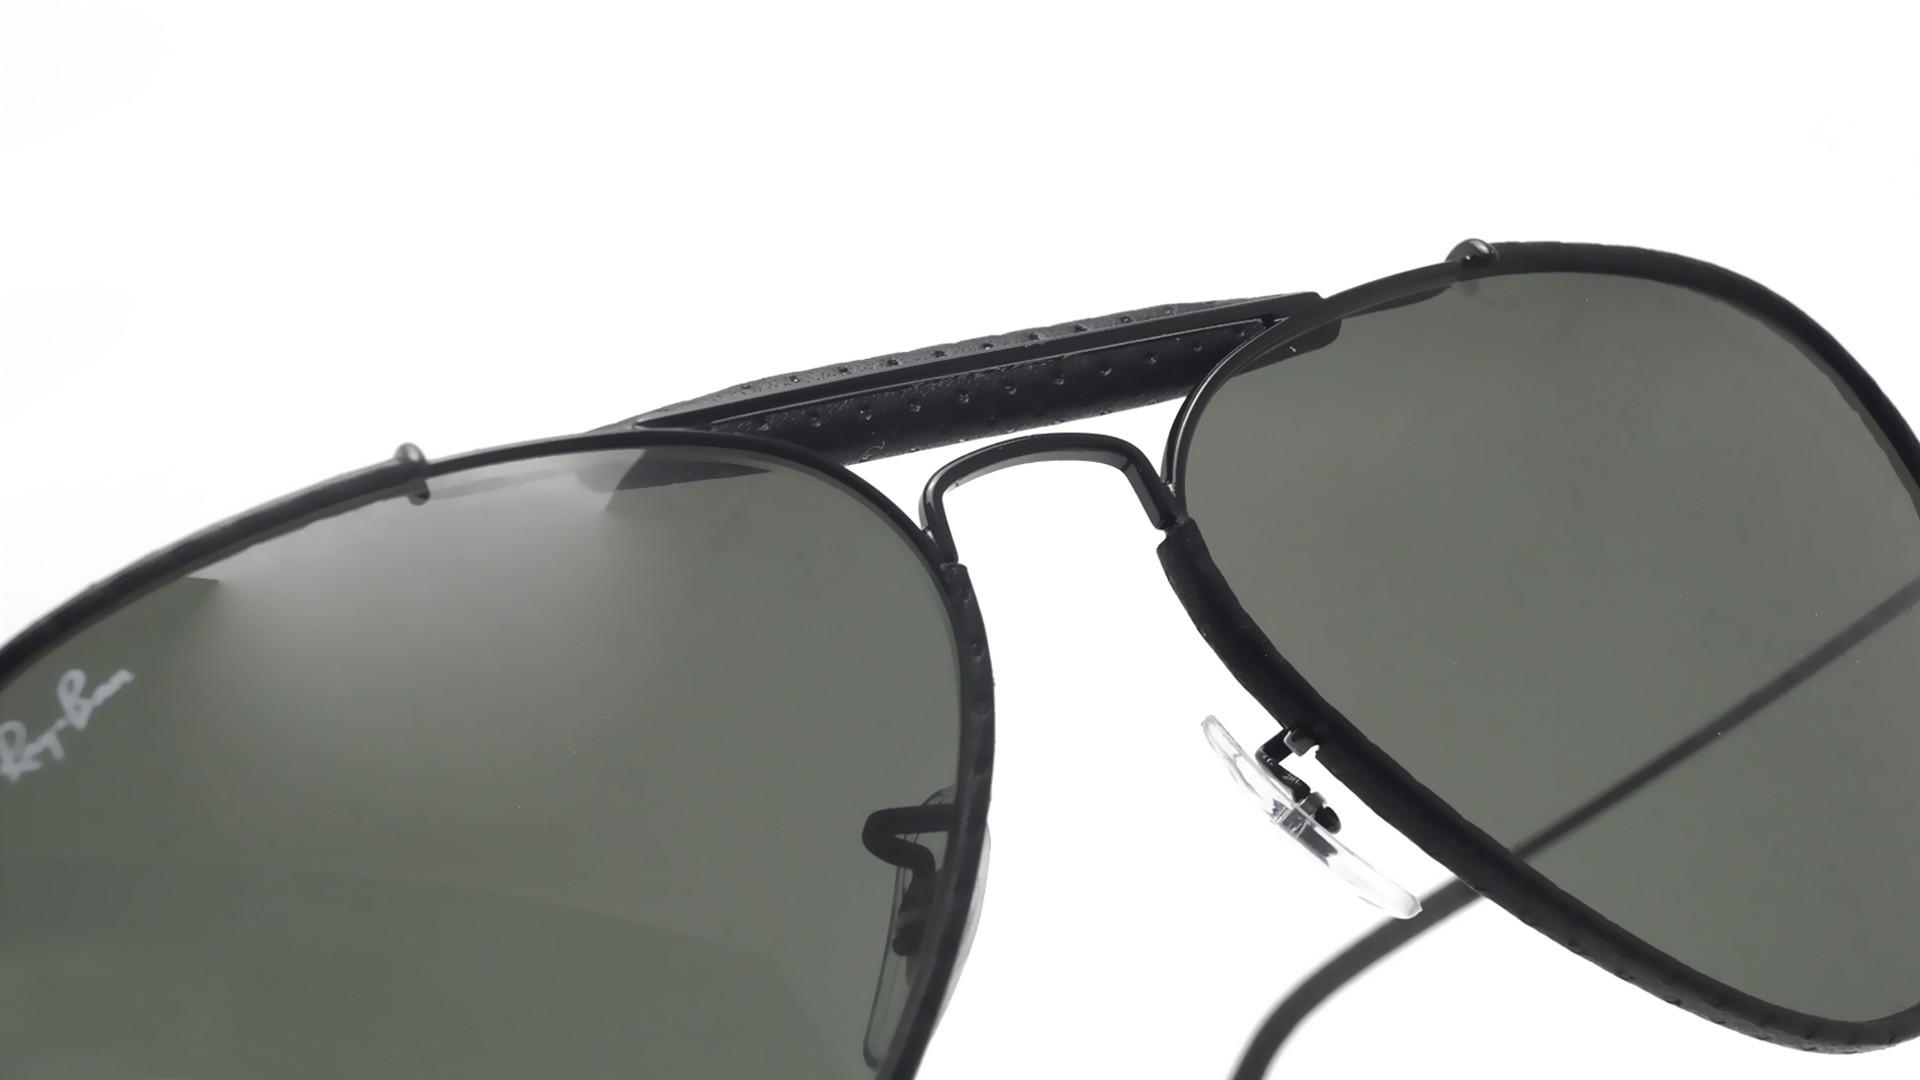 5fa2bccd37e Sunglasses Ray-Ban Outdoorsman Craft Black G-15 RB3422Q 9040 58-14 Large